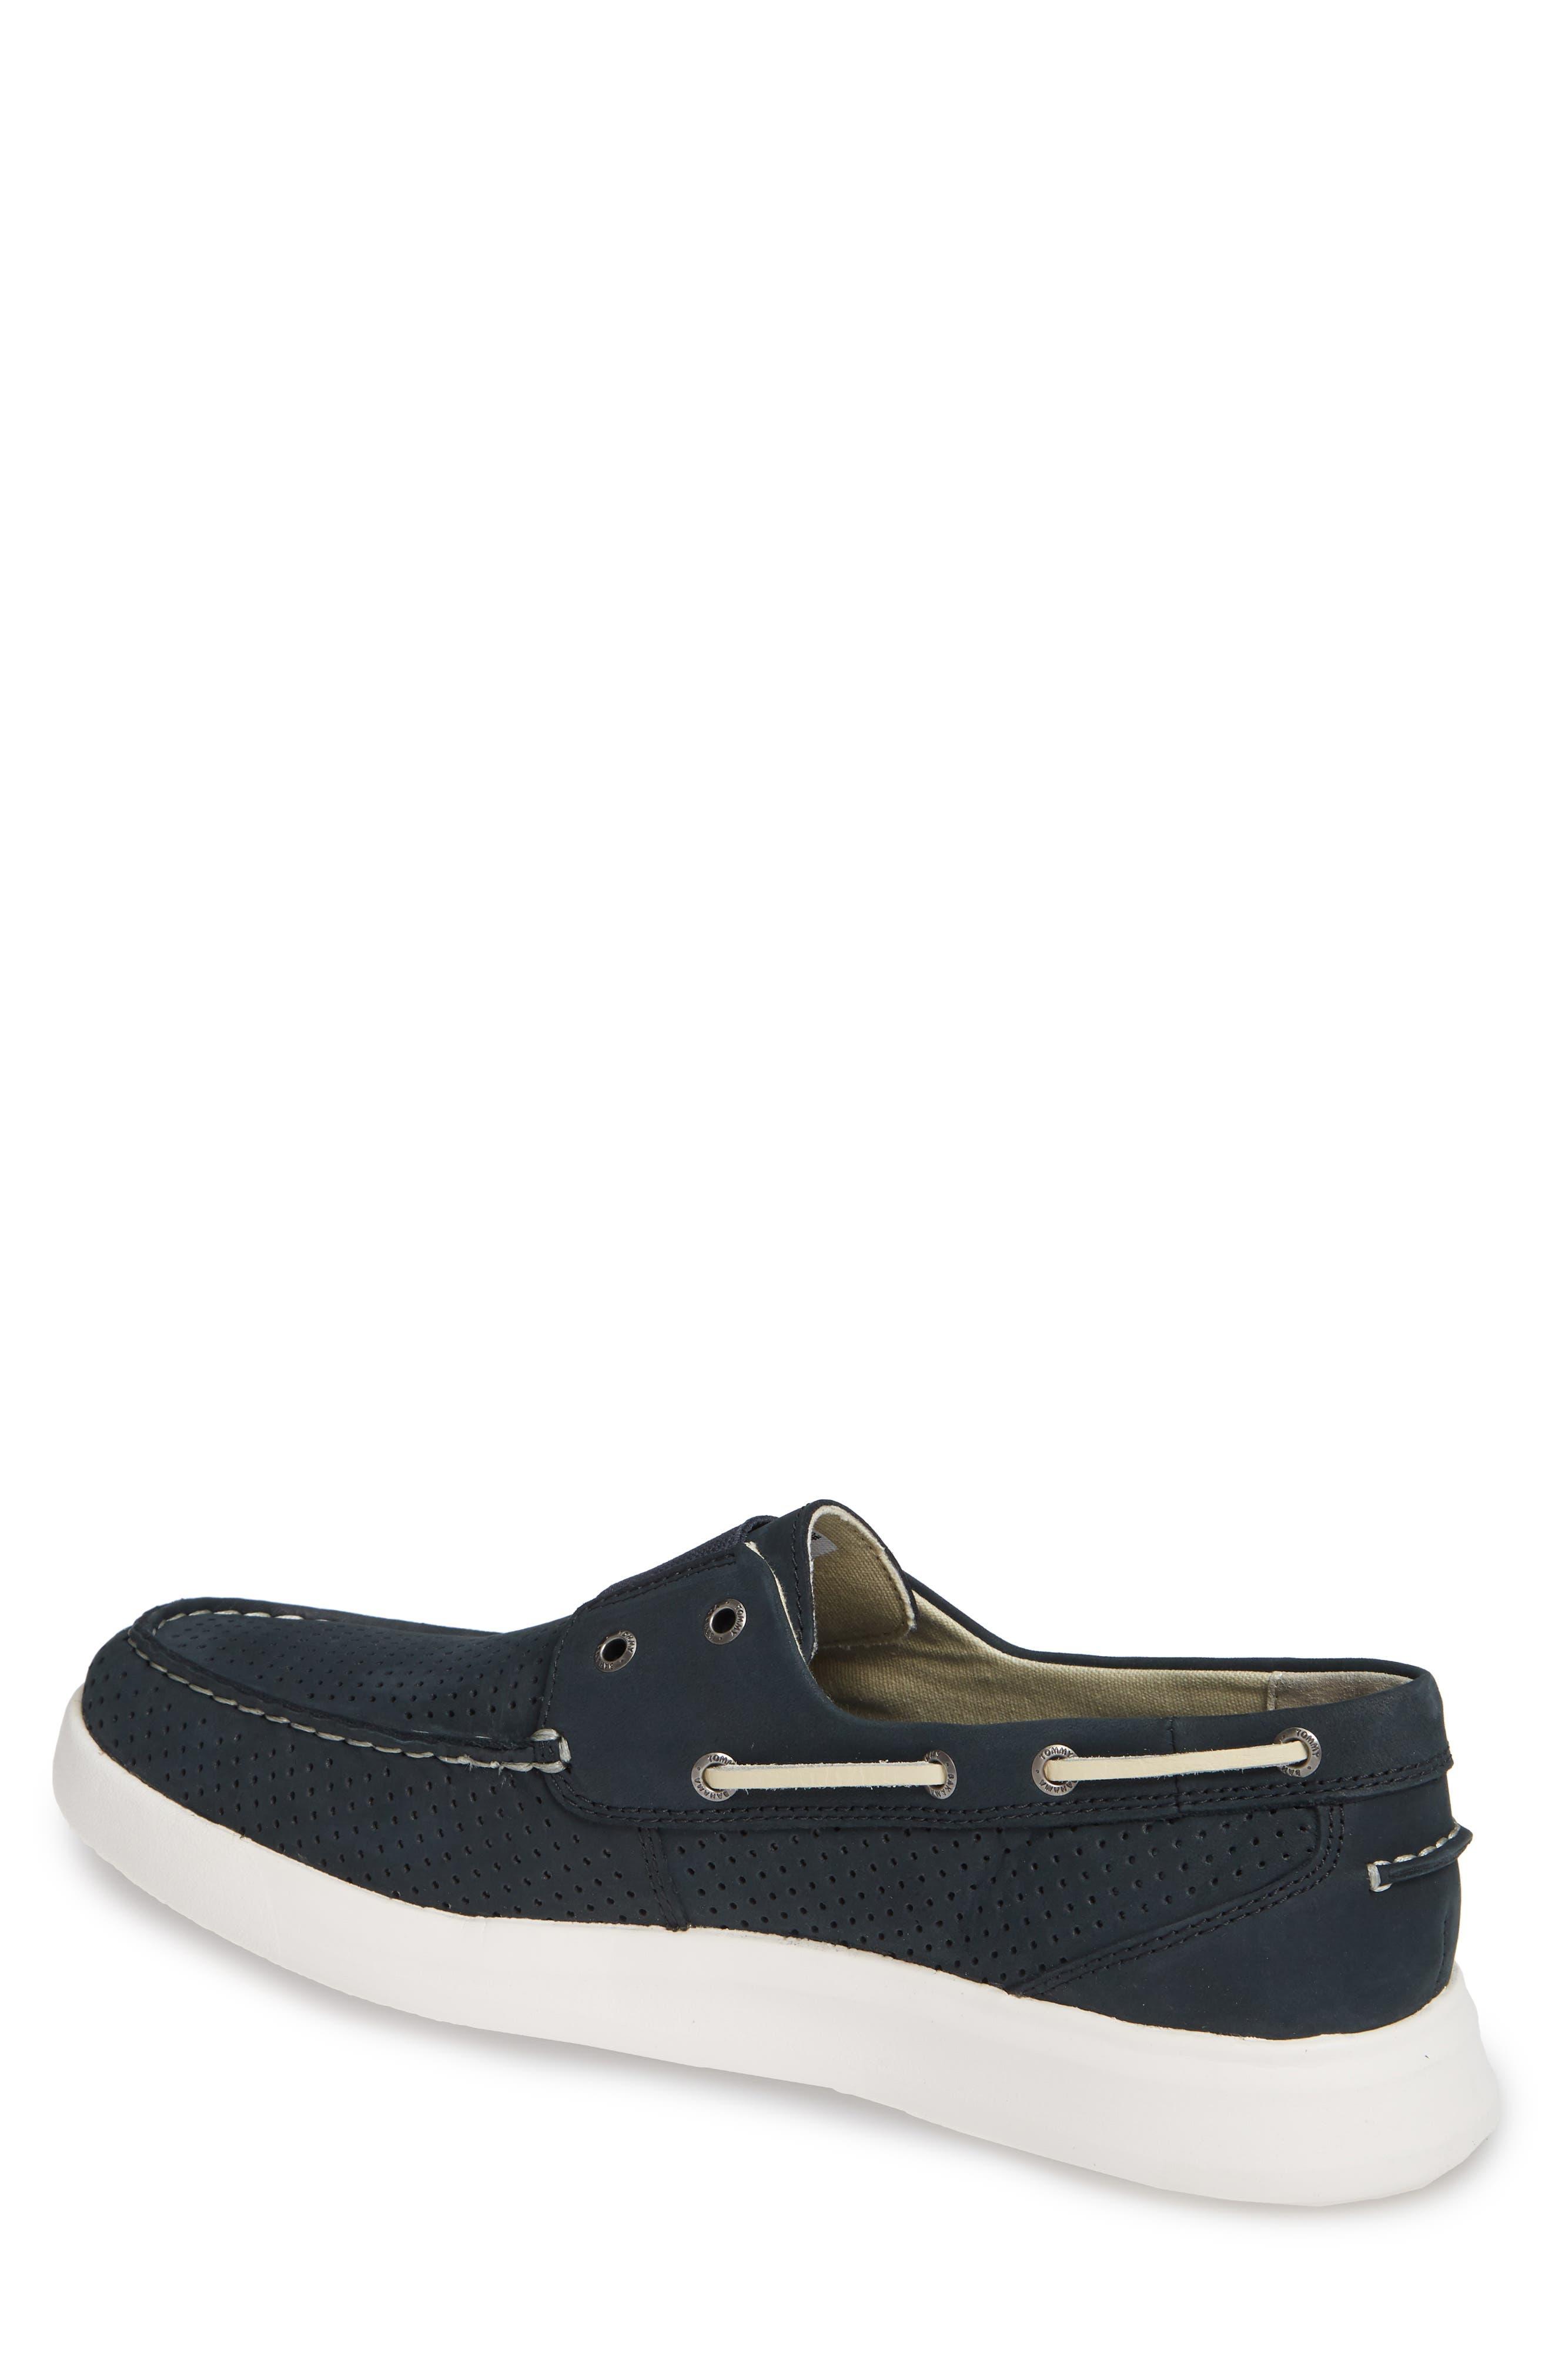 Tommy Bahama Aeonian Leather Boat Shoe